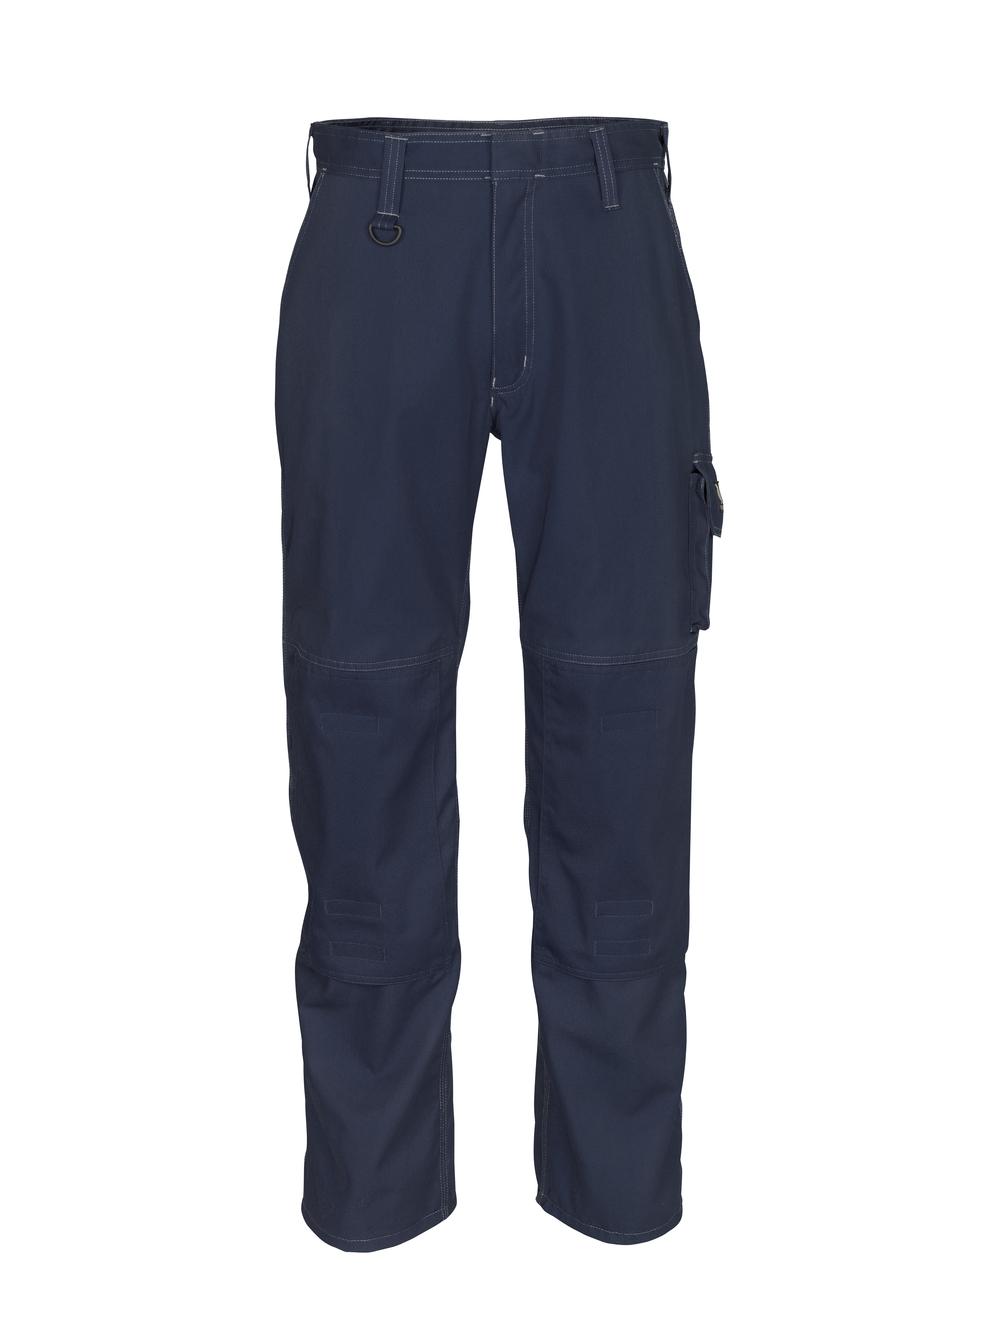 MASCOT BILOXI KNEEPAD PANTS